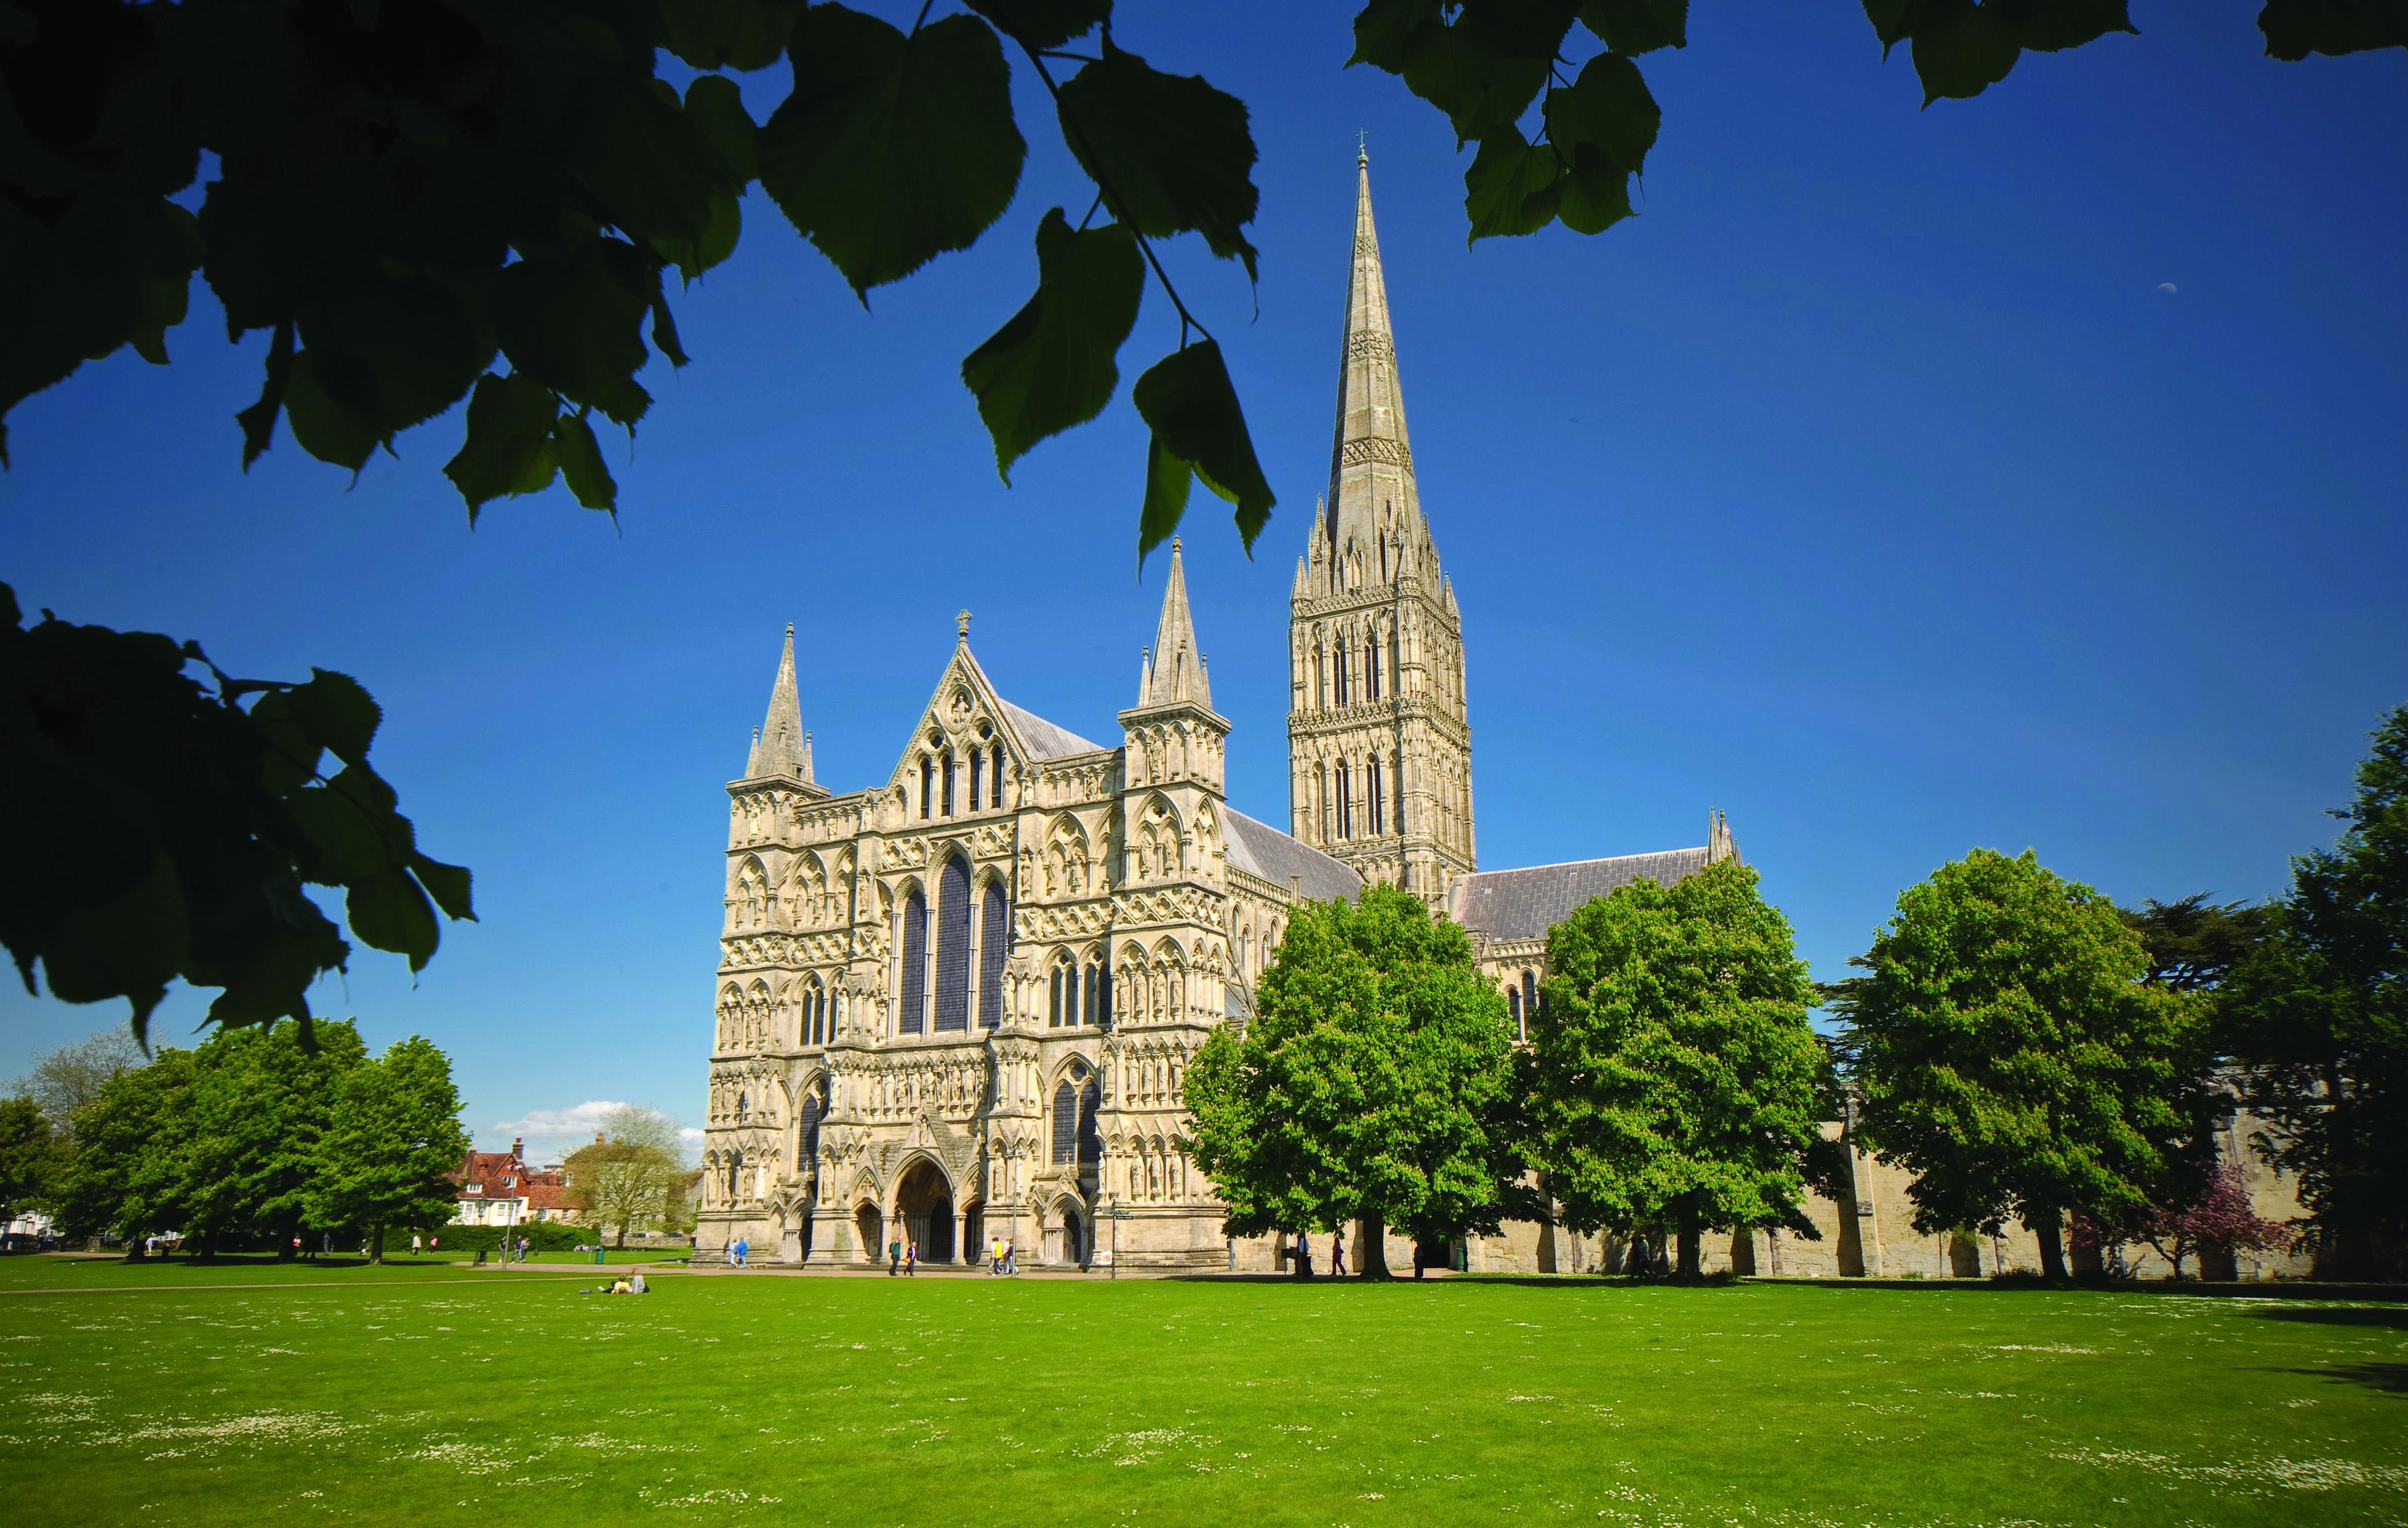 salisbury cathedral - photo #23